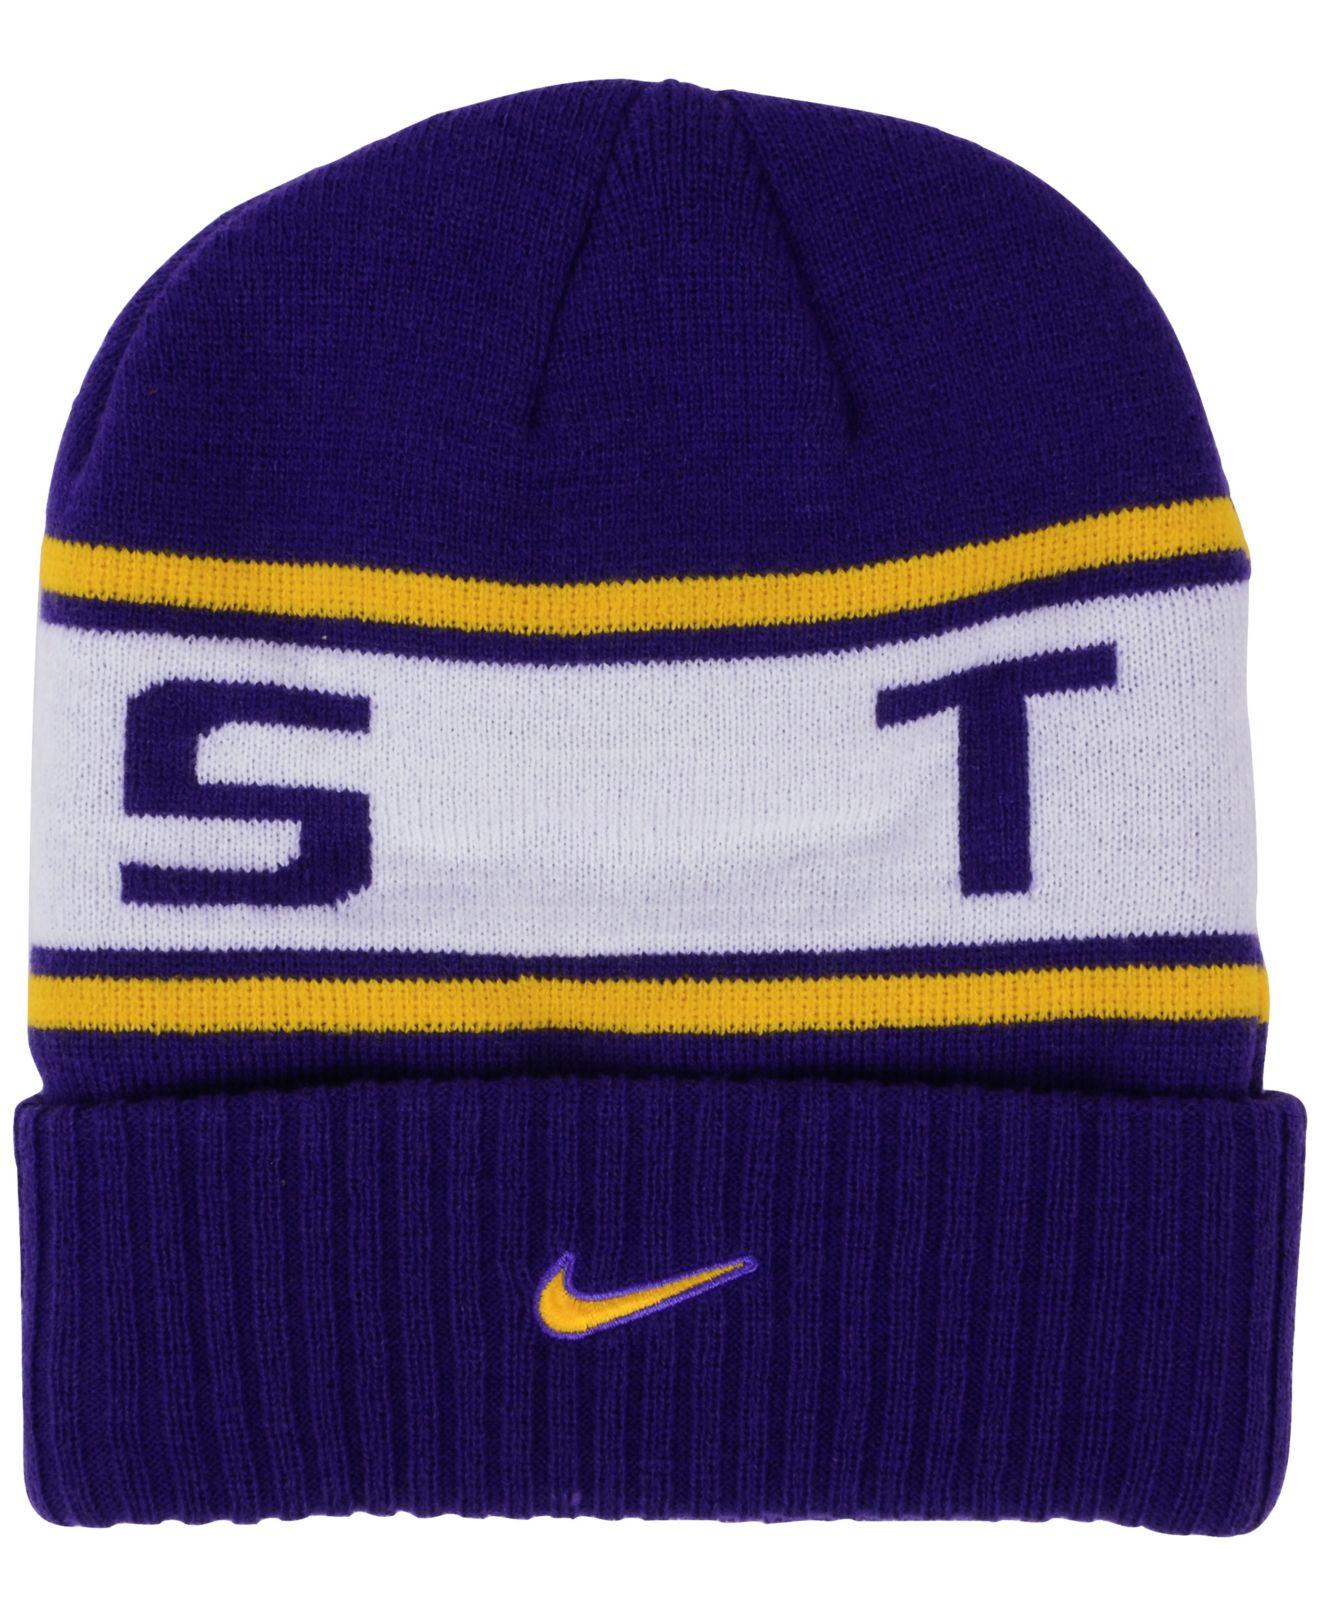 super popular d592f 876cc Lyst - Nike Lsu Tigers Sideline Knit Hat in Blue for Men